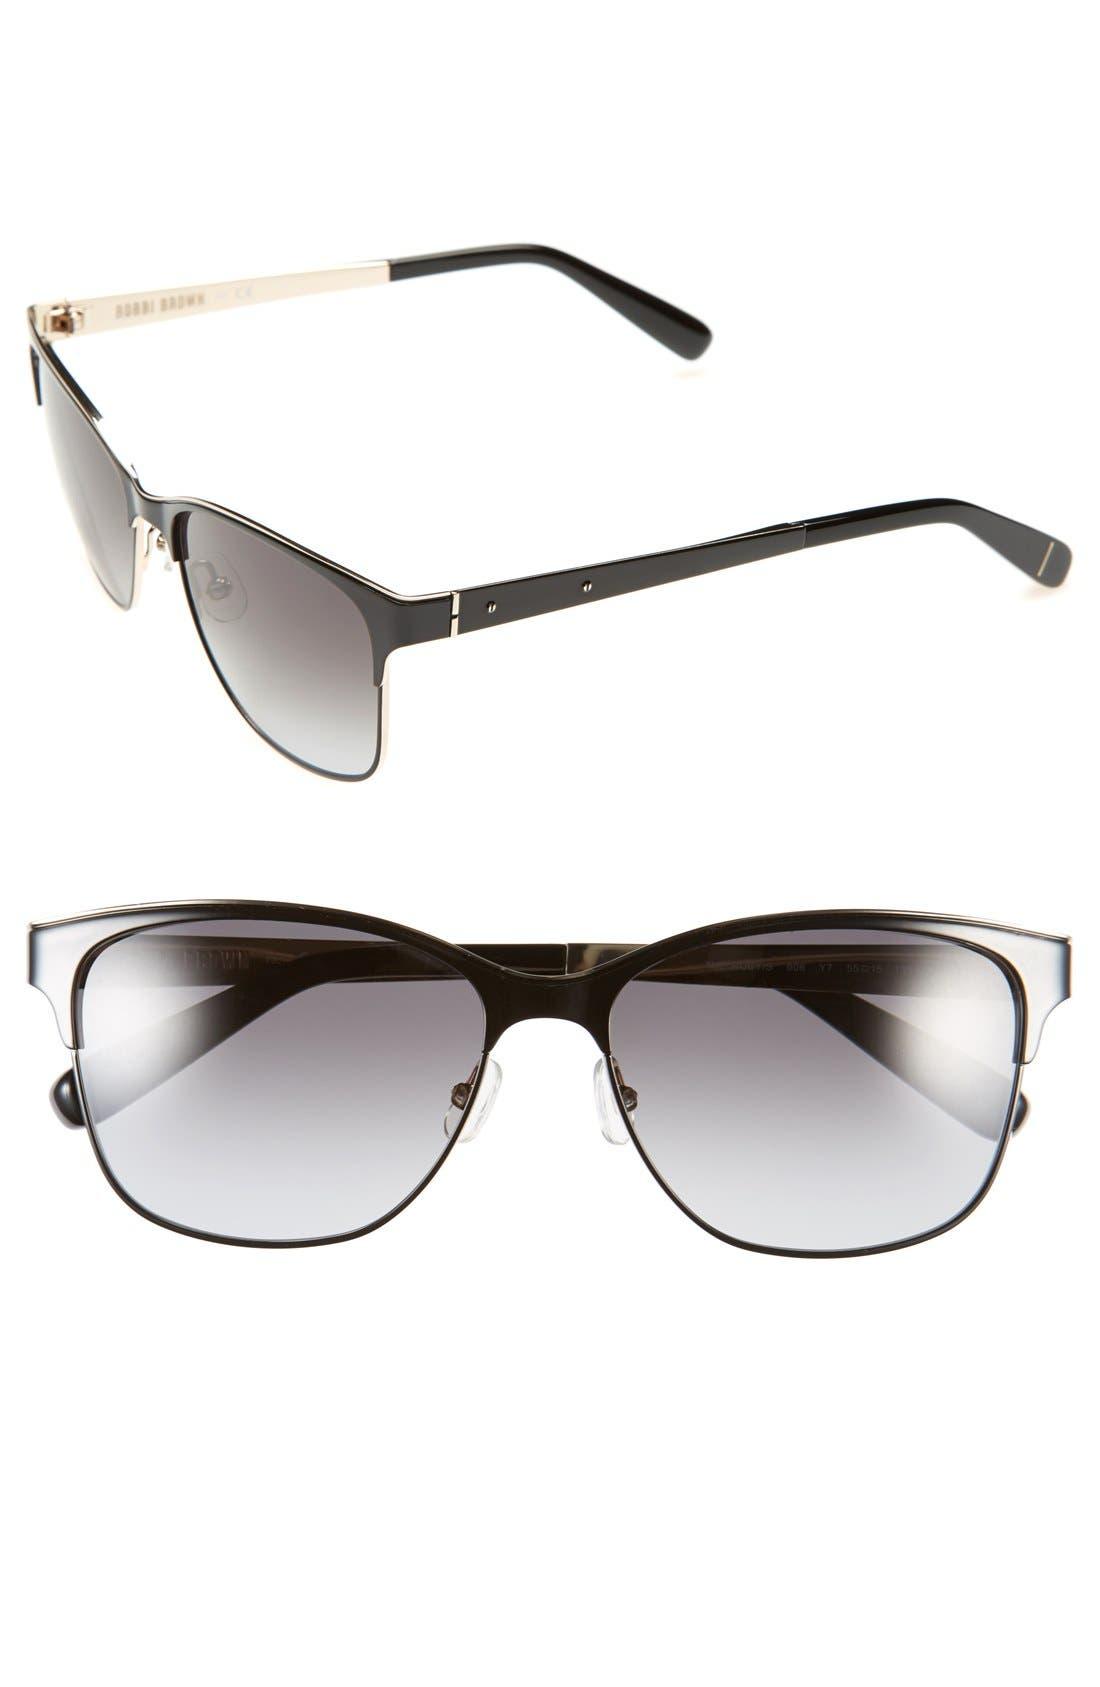 Main Image - Bobbi Brown 'The Ruby' 55mm Sunglasses